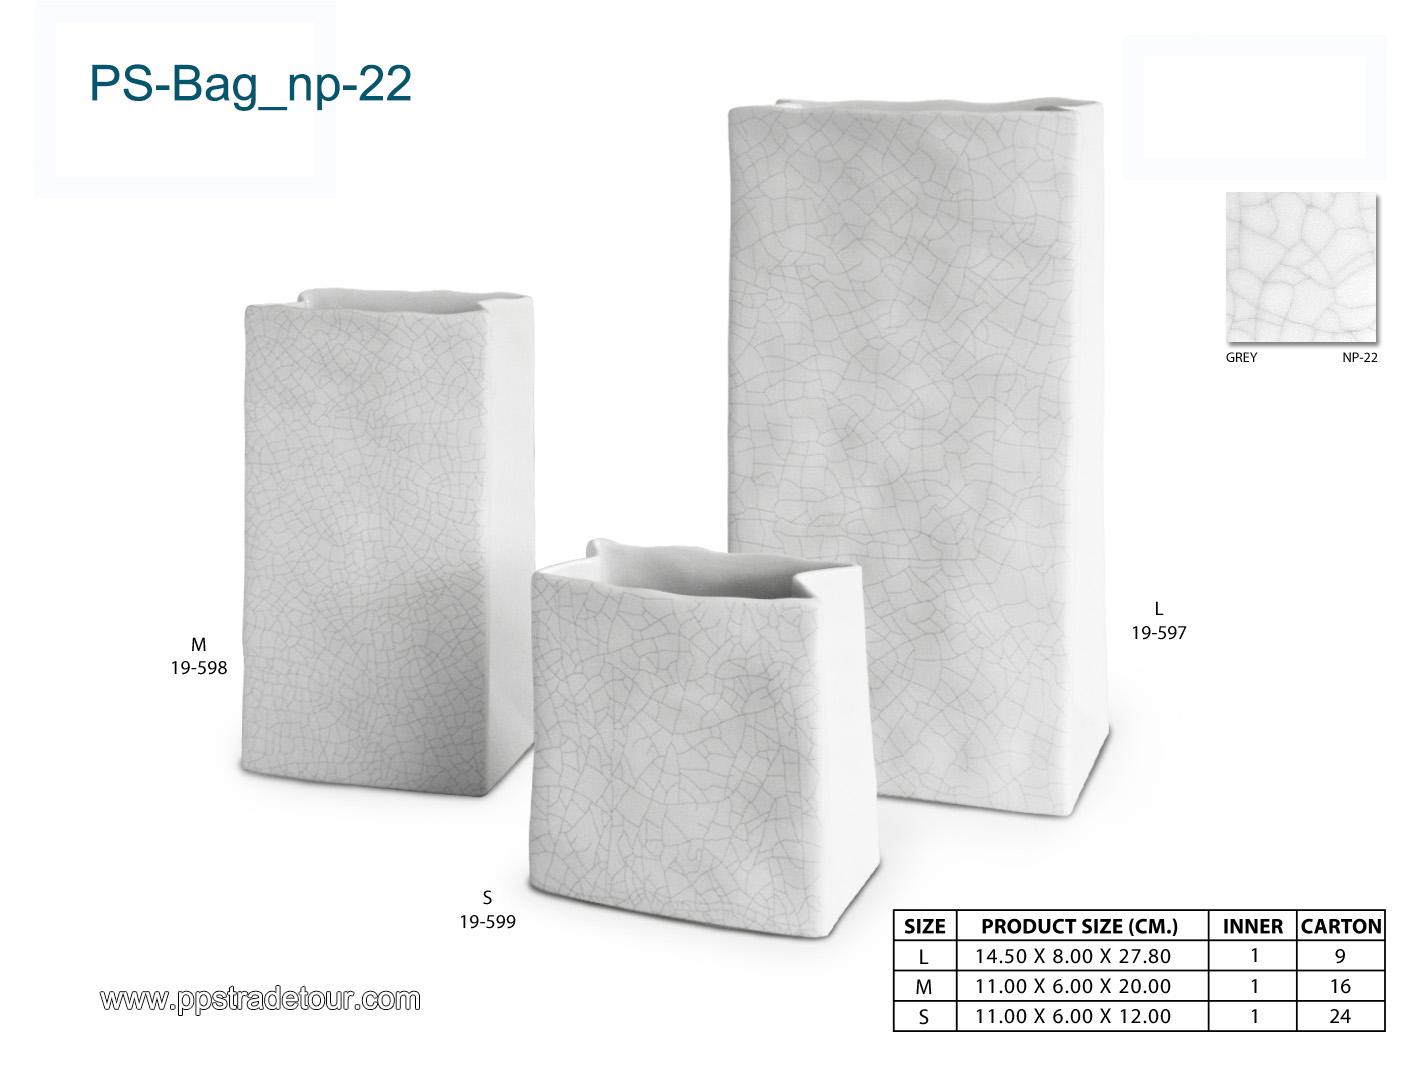 PSCV-Bag_np-22